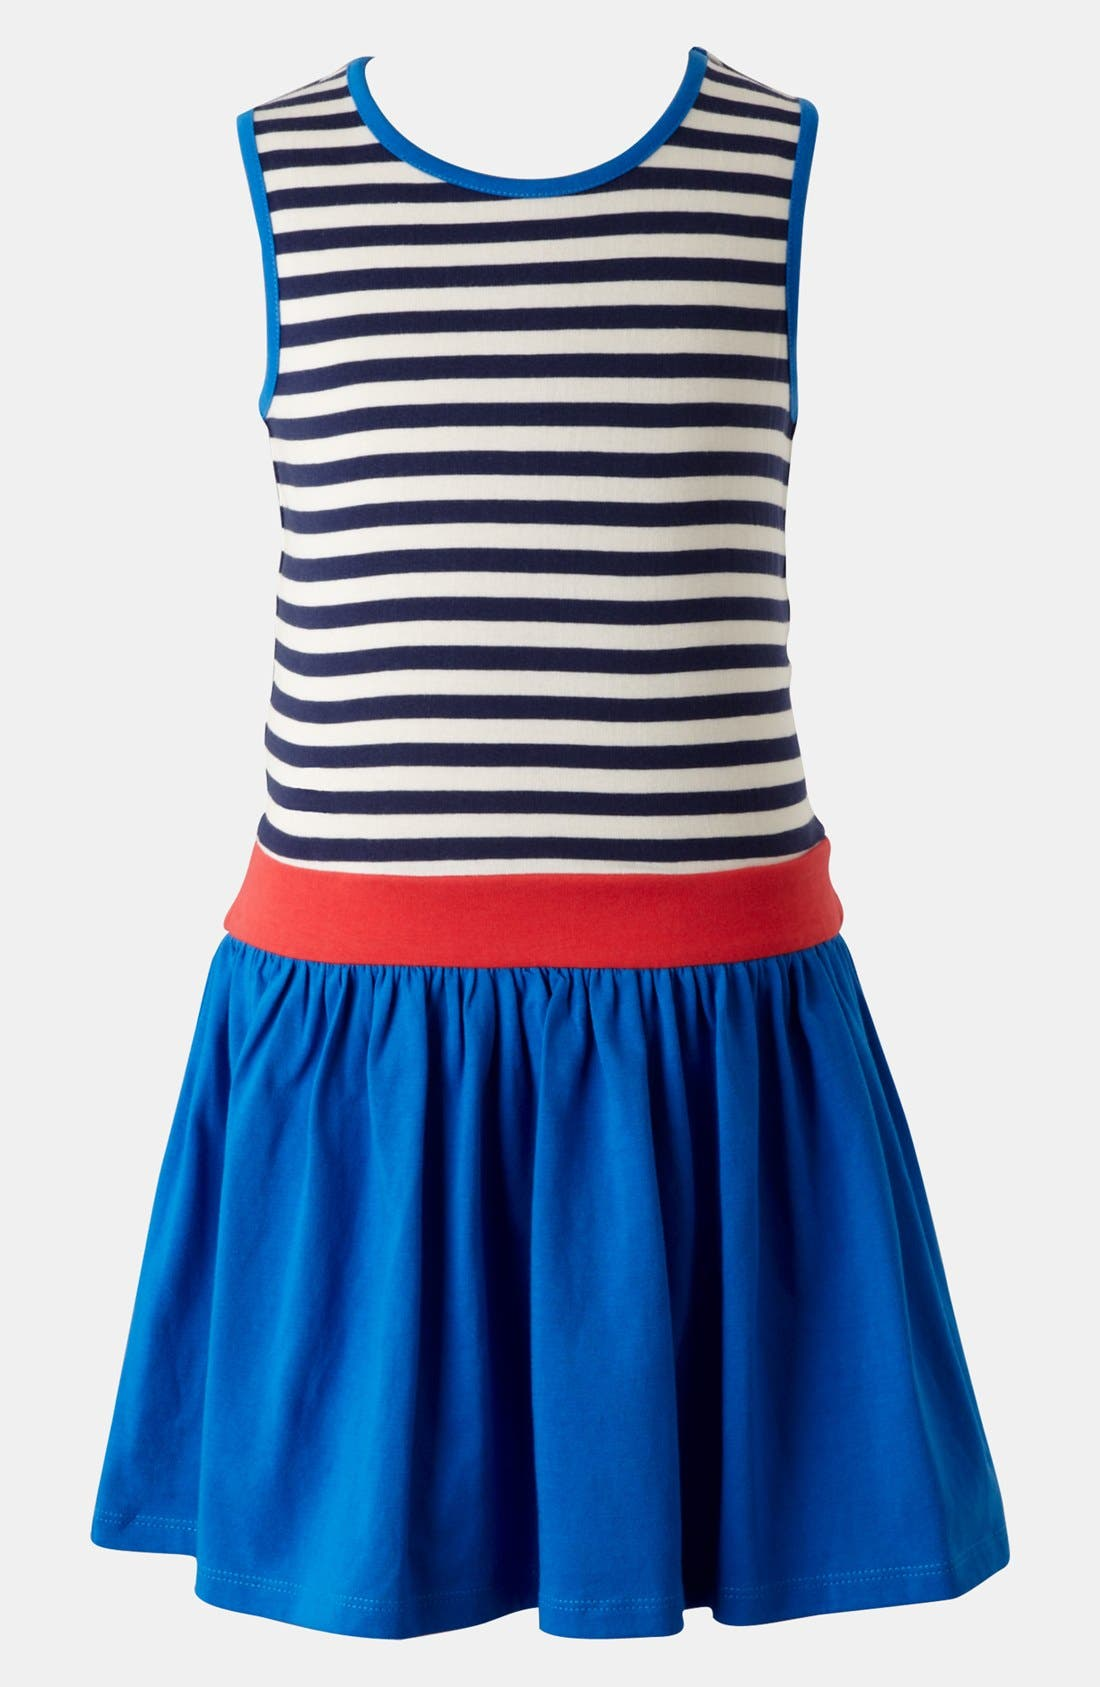 Alternate Image 1 Selected - Mini Boden 'Jolly Jersey' Dress (Little Girls & Big Girls)